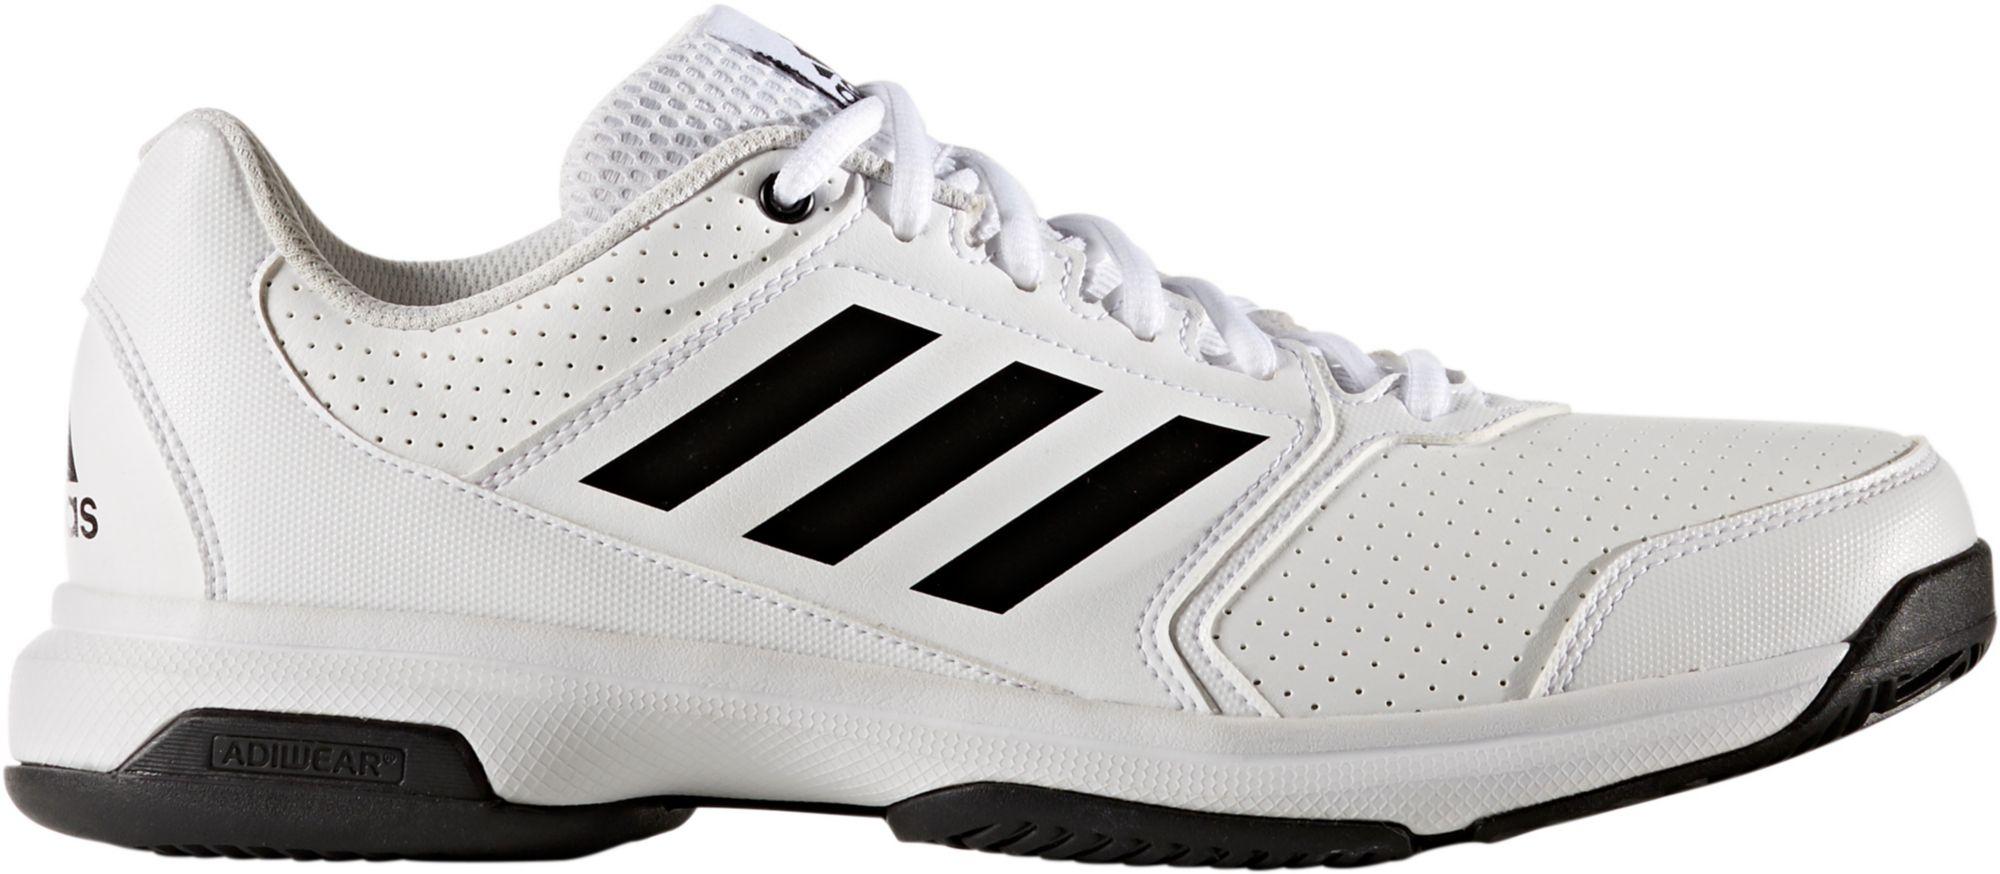 adidas menu0027s adizero attack tennis shoes | dicku0027s sporting goods EOUPUVU